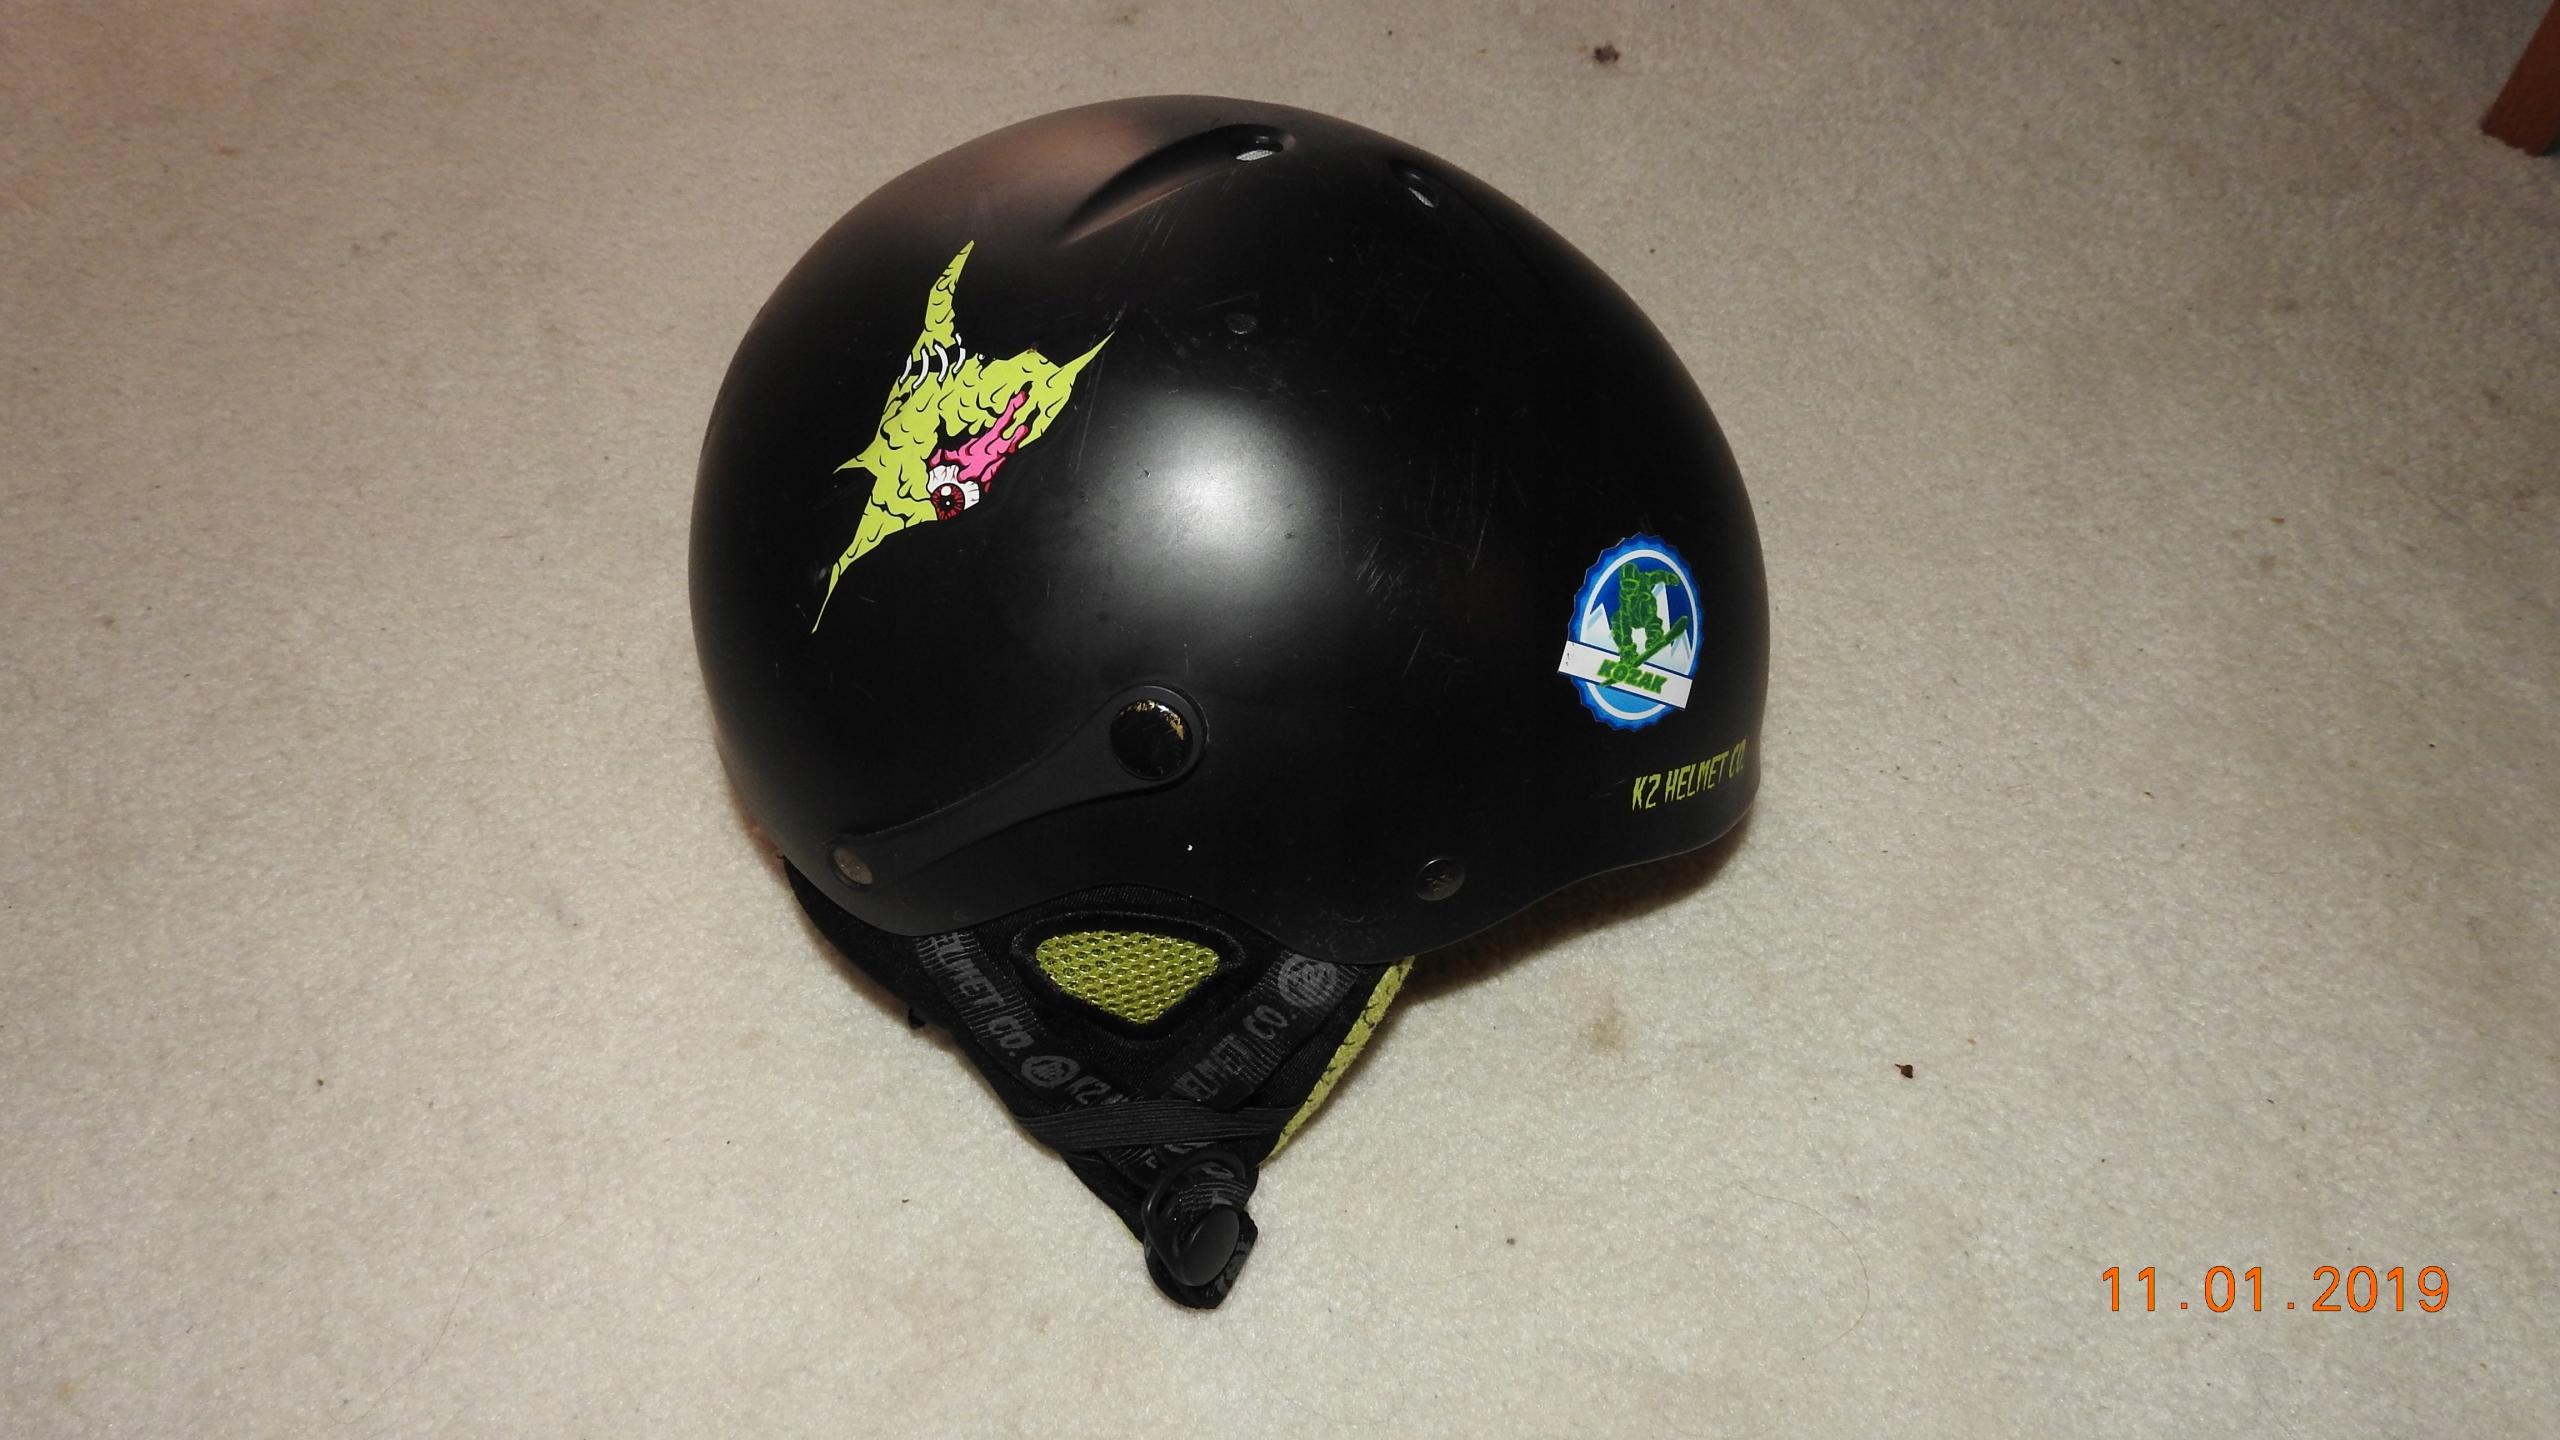 Kask snowbordowo-narciarski K2 Shadow Black Slime